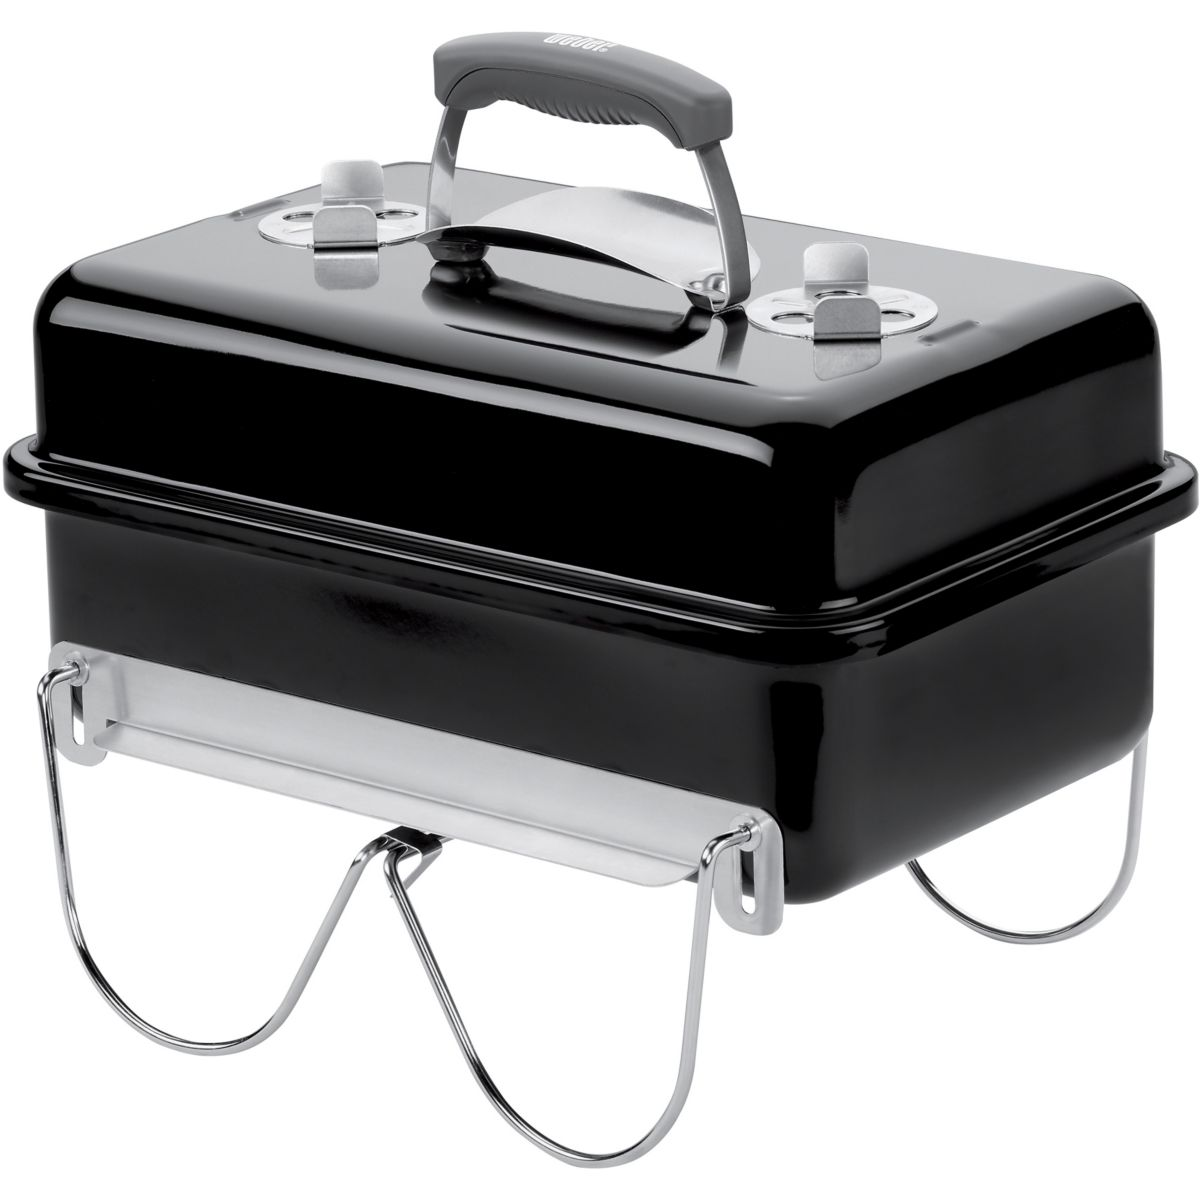 Barbecue WEBER GO ANYWHERE BLACK CHARBON (photo)